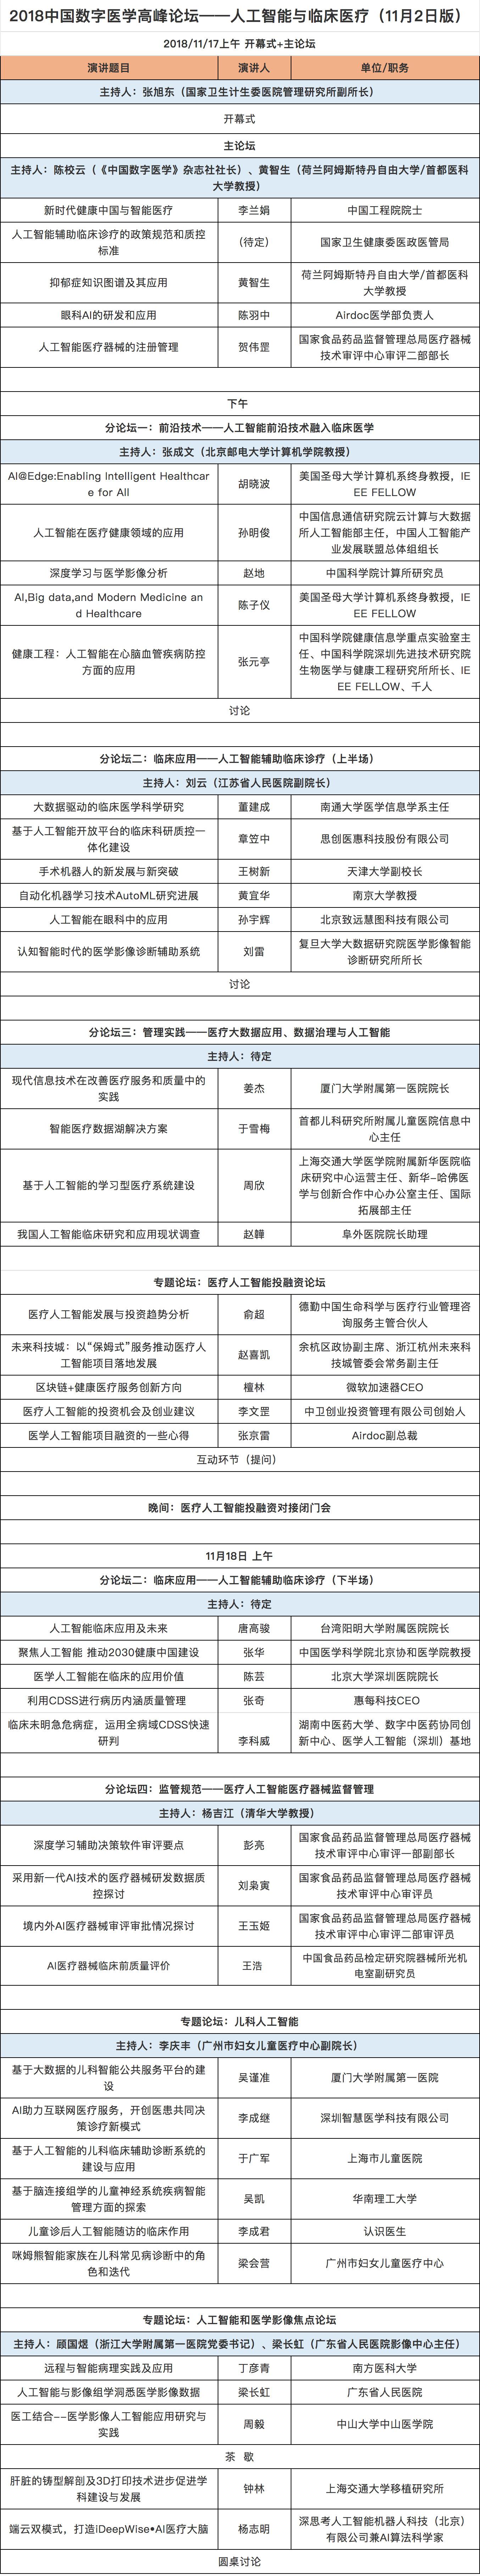 FireShot-Capture-12---中国数字医学---https___mp.weixin.qq.com_s_RQ3cHYdir8f851LPR9yraw